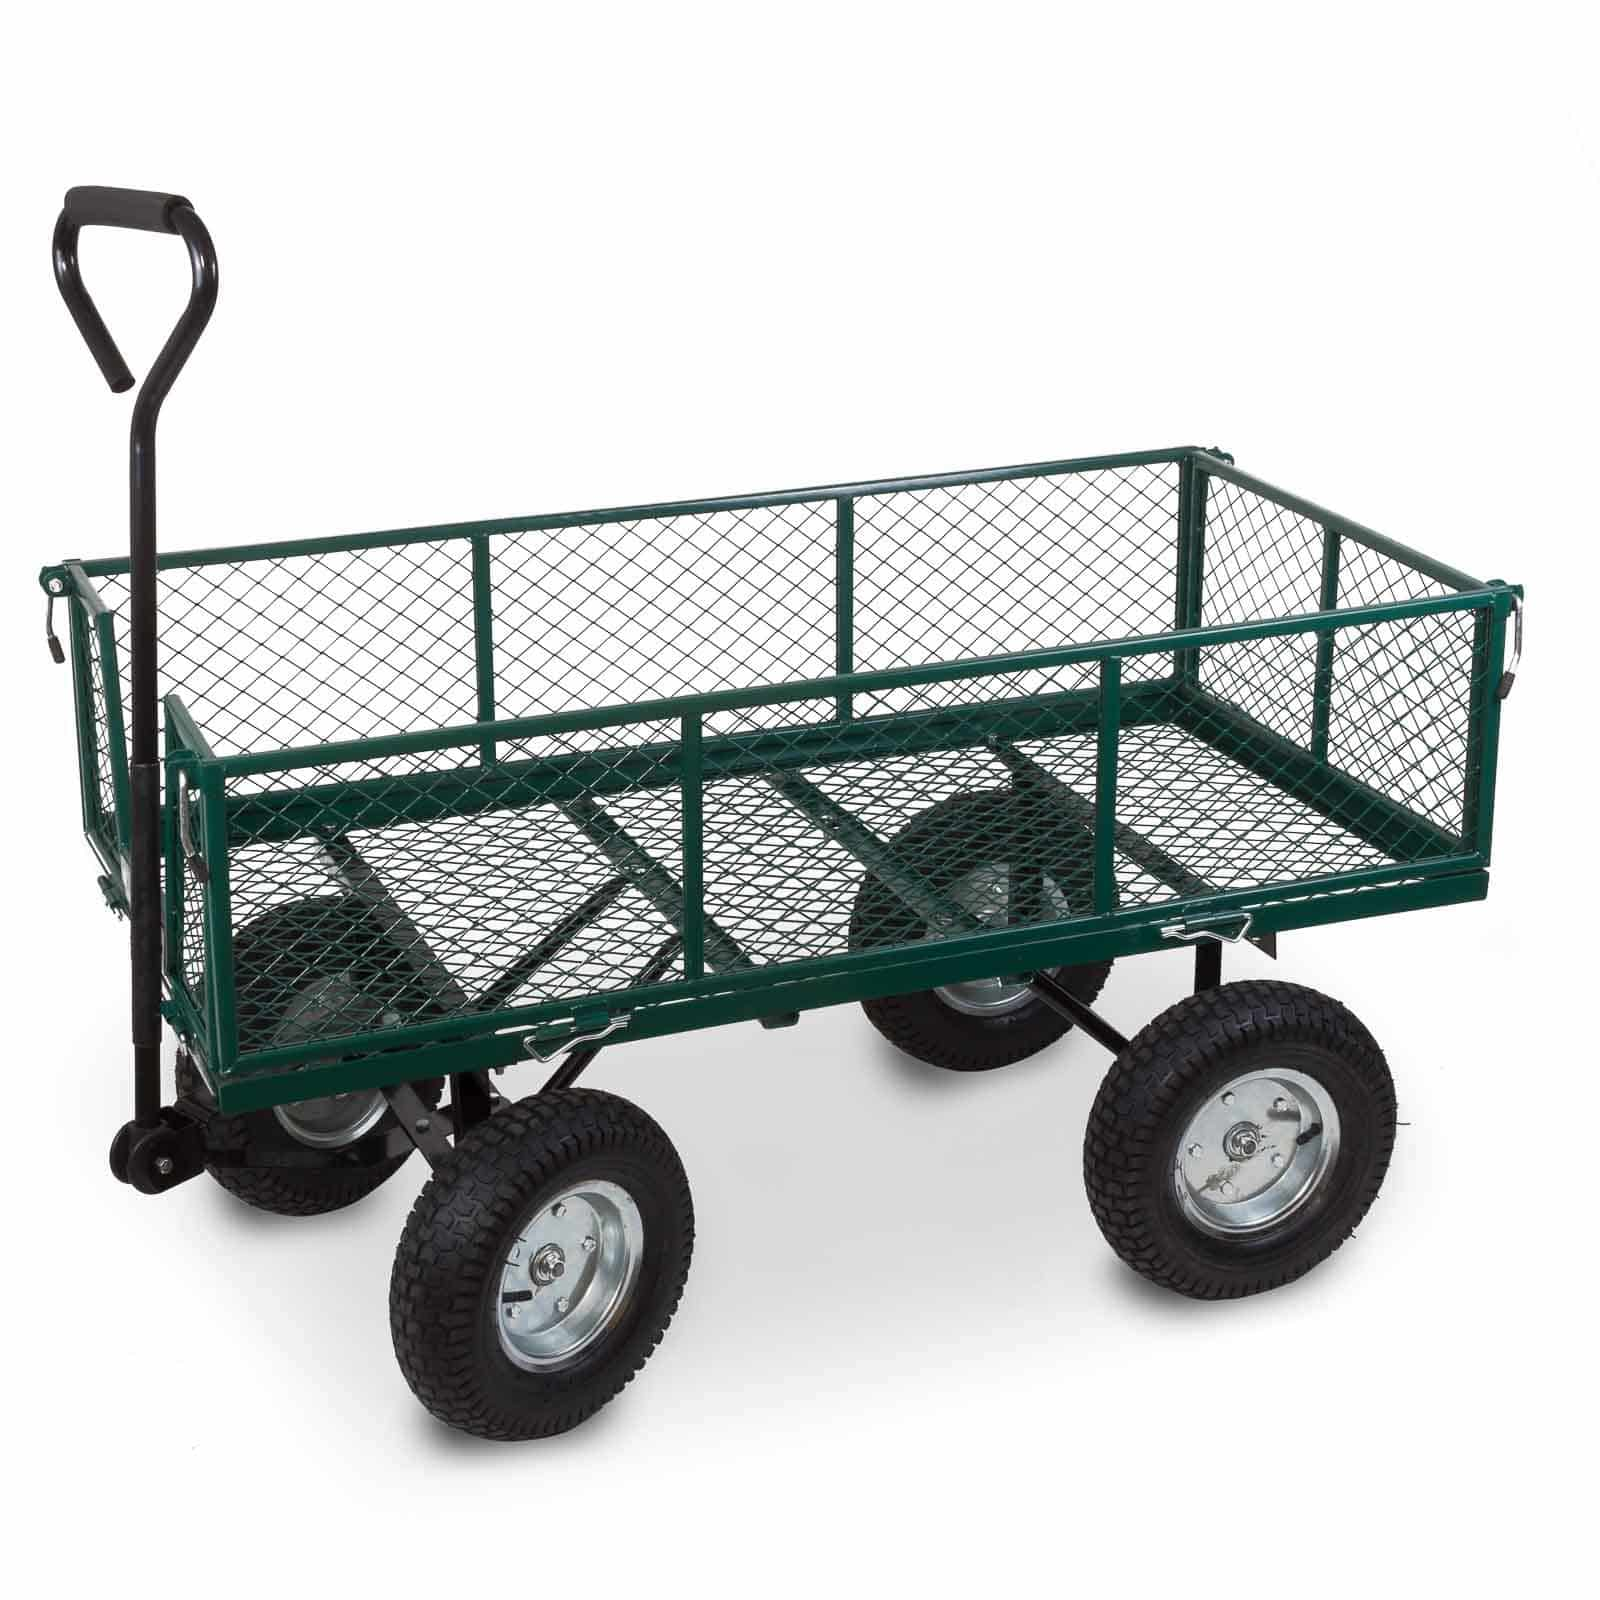 Hanse Werkzeuge Transportkar XXL - 500kg belasting - 123x61x103cm